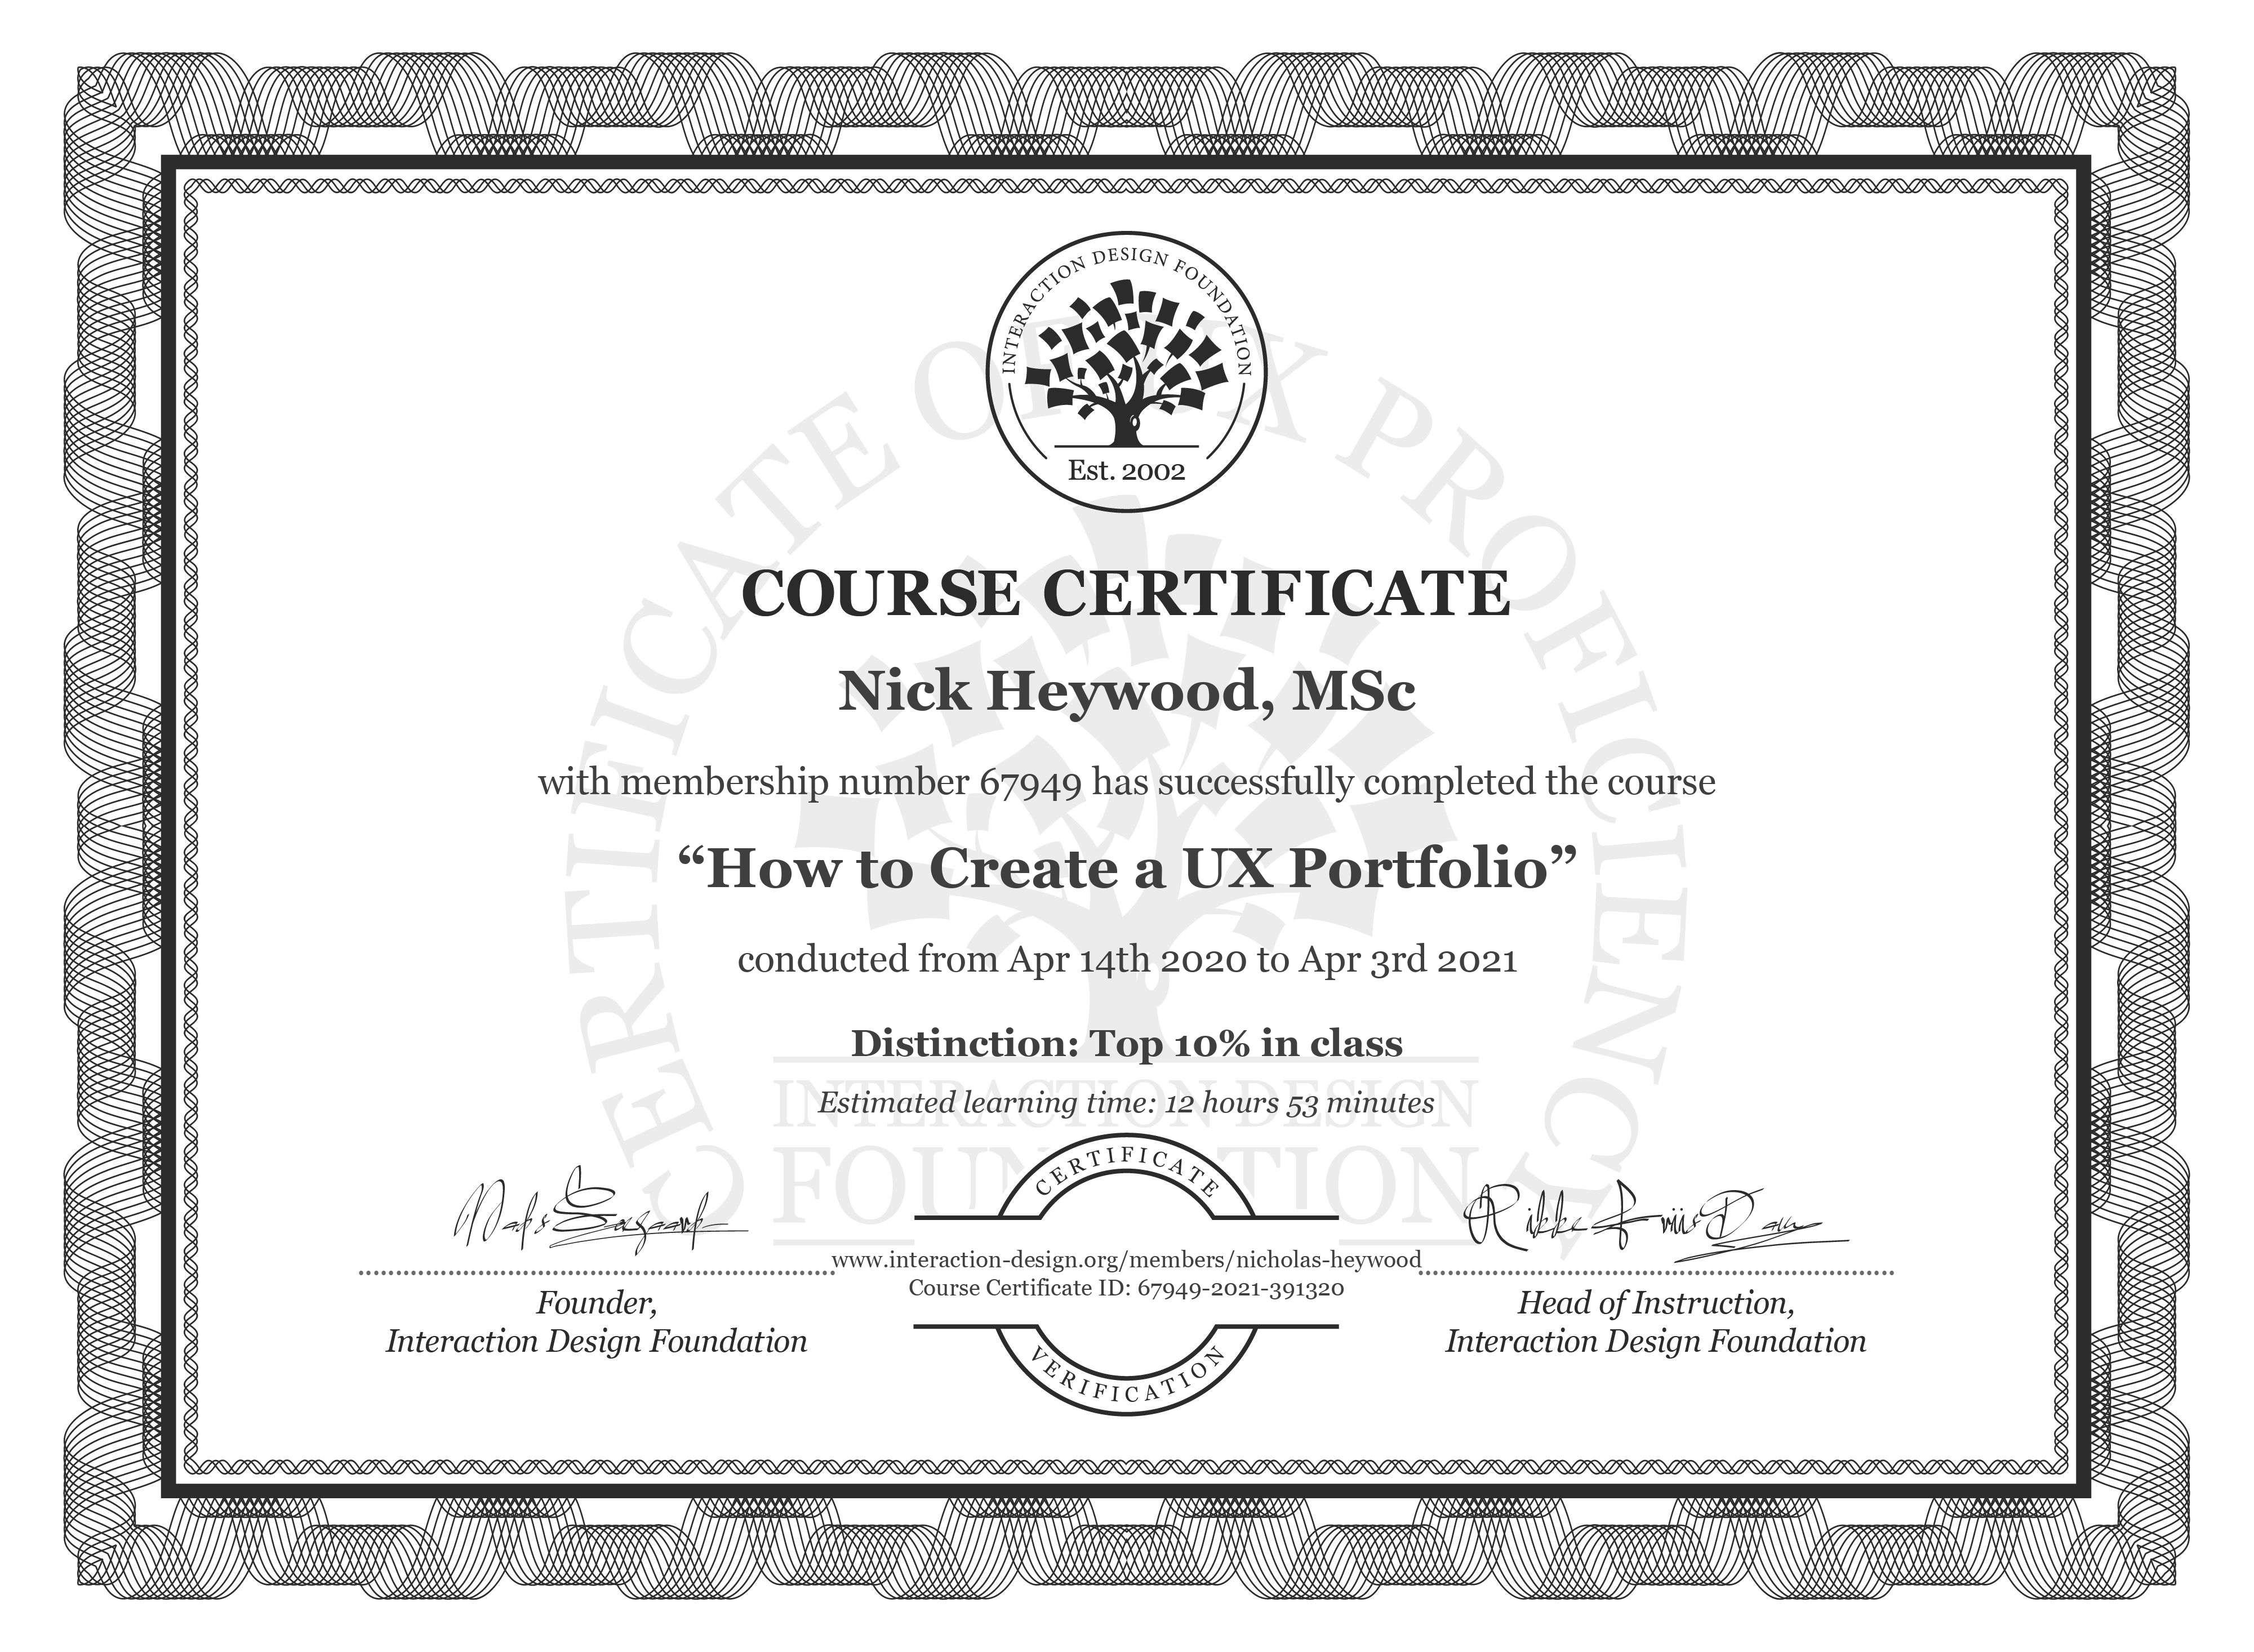 Nicholas Heywood's Course Certificate: How to Create a UX Portfolio